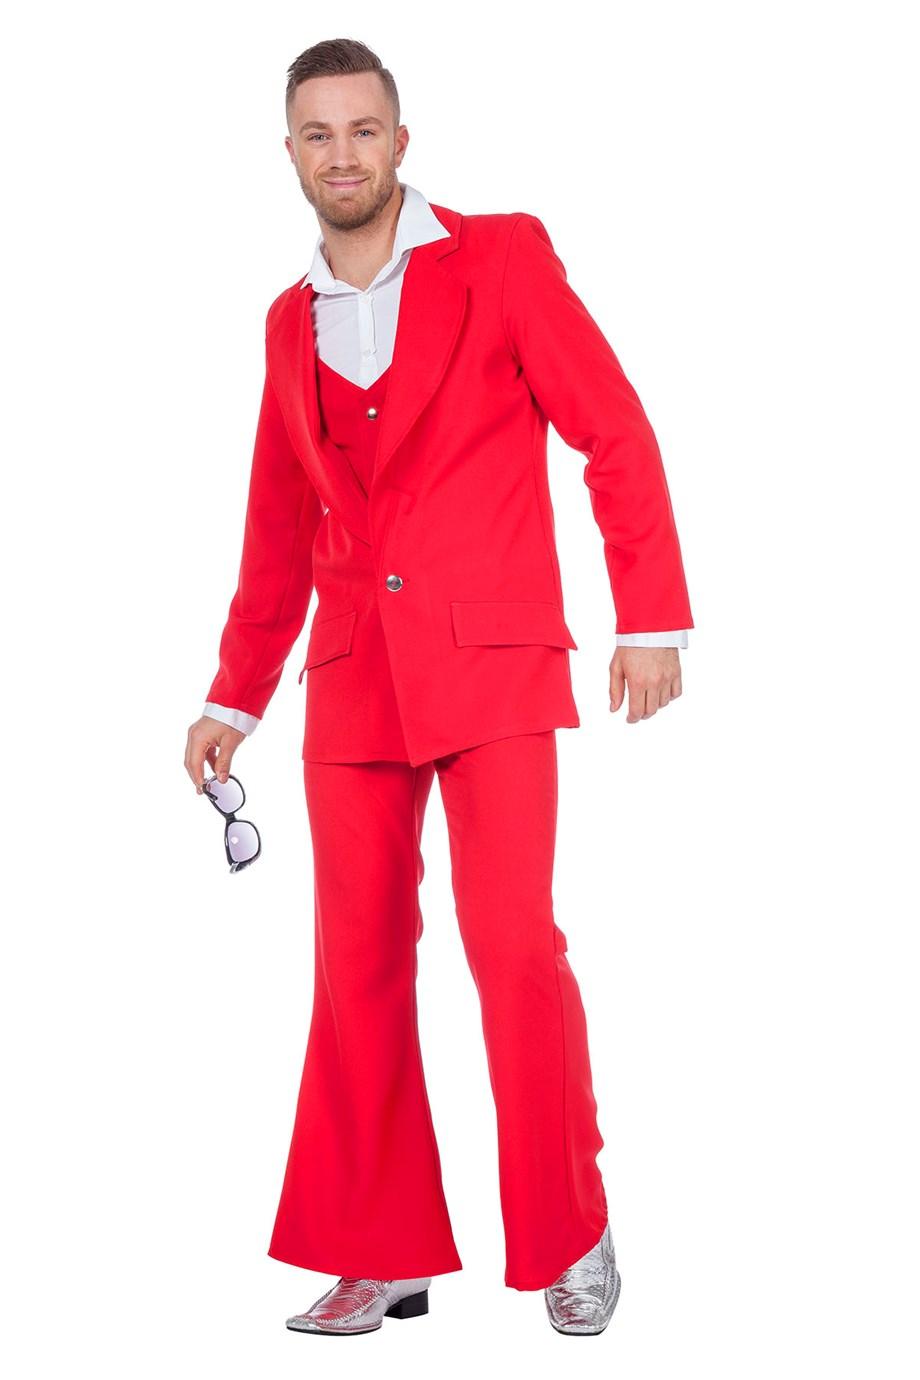 70-luku miesten puvut